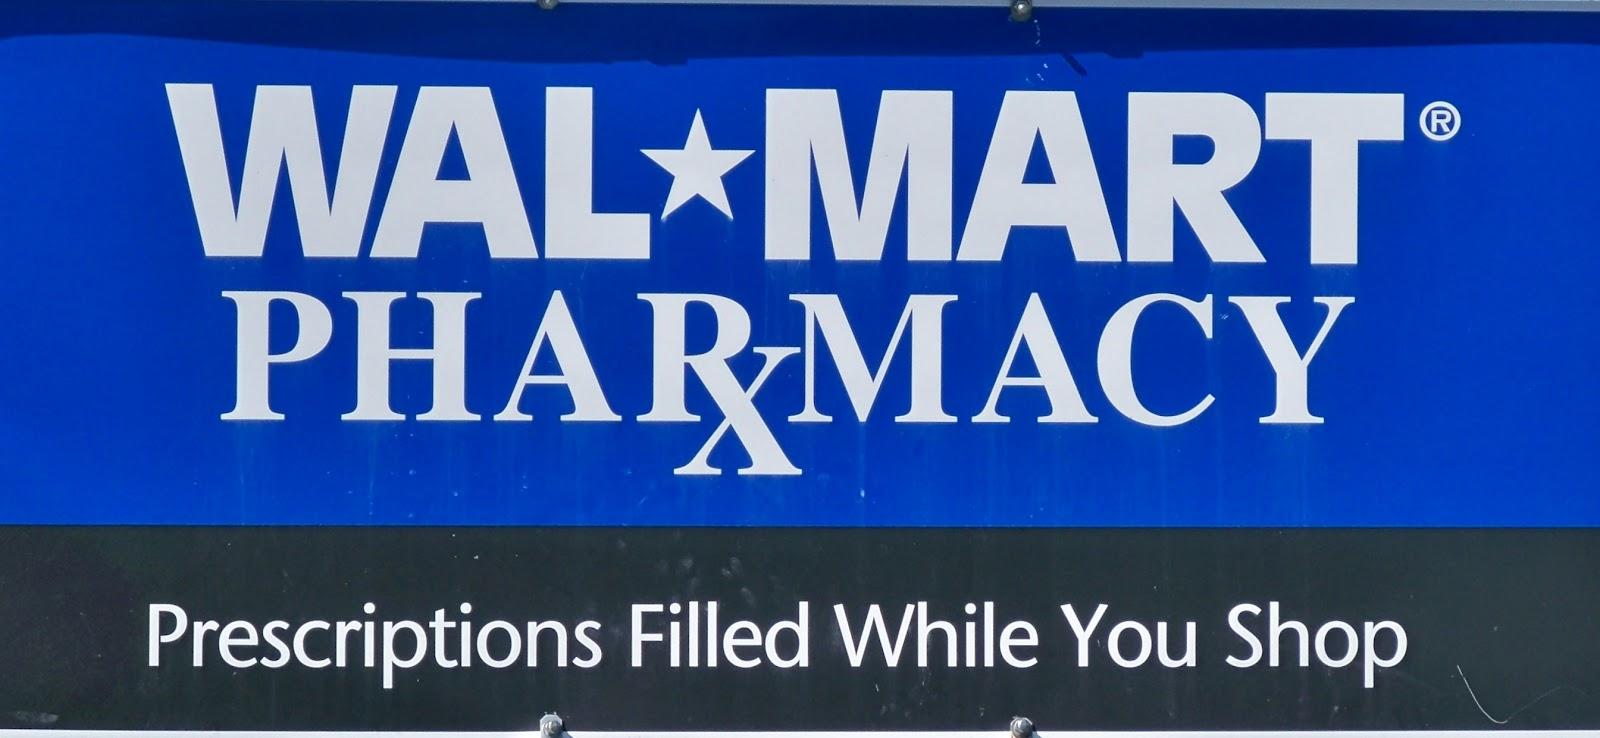 phone number to walmart